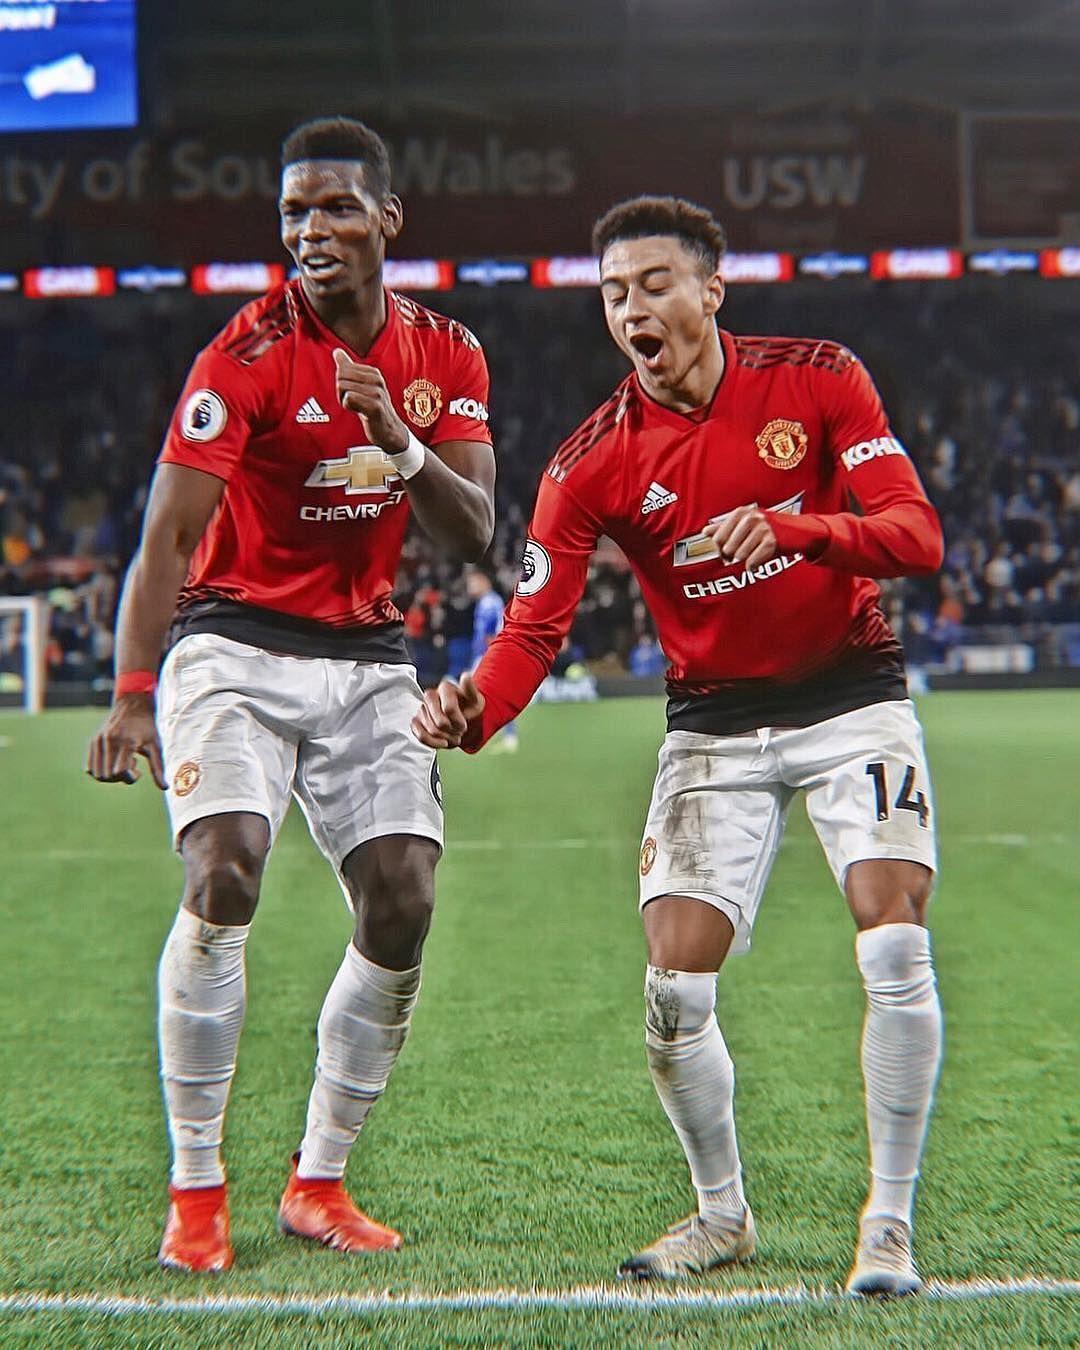 Paulpogba Jesselingard Jlingz Mufc Manchesterunited Mo Manchester United Premier League Lingard Manchester United Manchester United Team